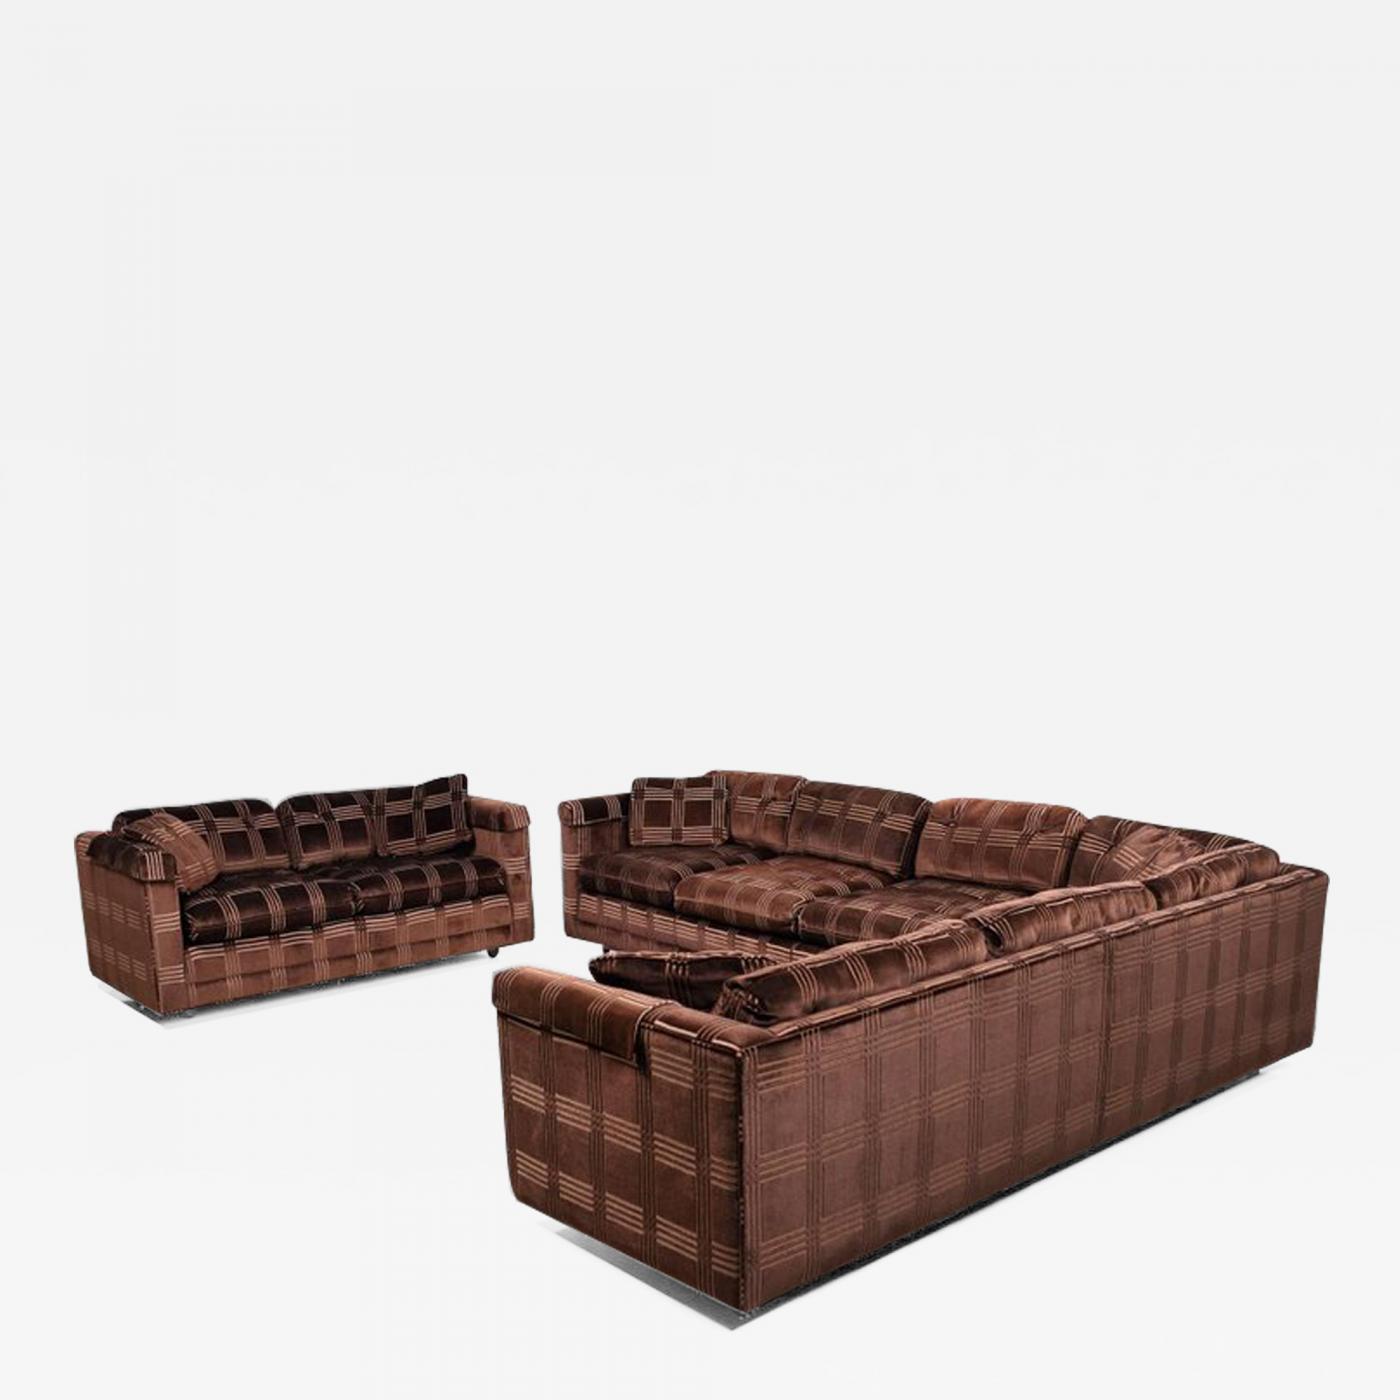 Fabelhaft Sofa Velour Foto Von Listings / Furniture / Seating / Sofas